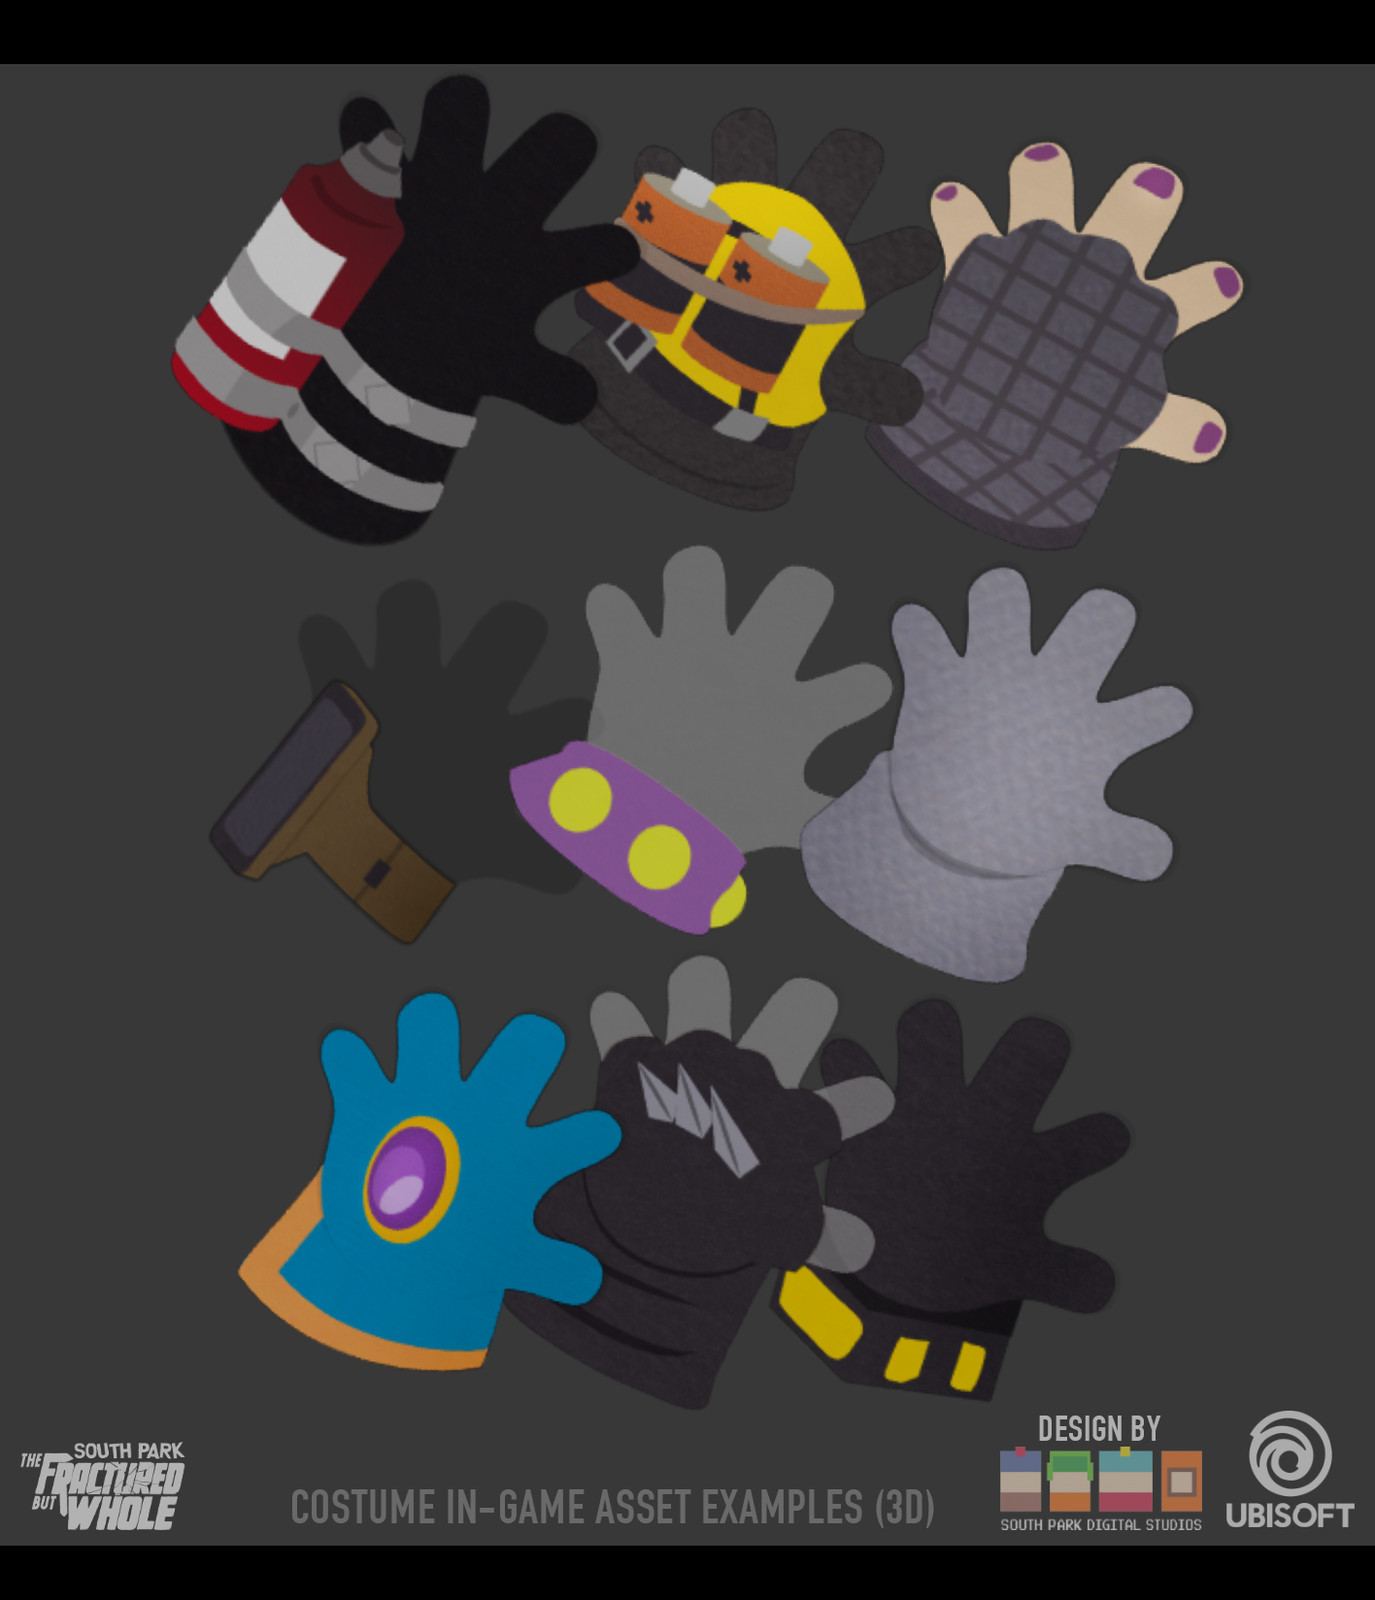 Selection of gloves made in Maya - Original Designs by South Park Digital Studios.